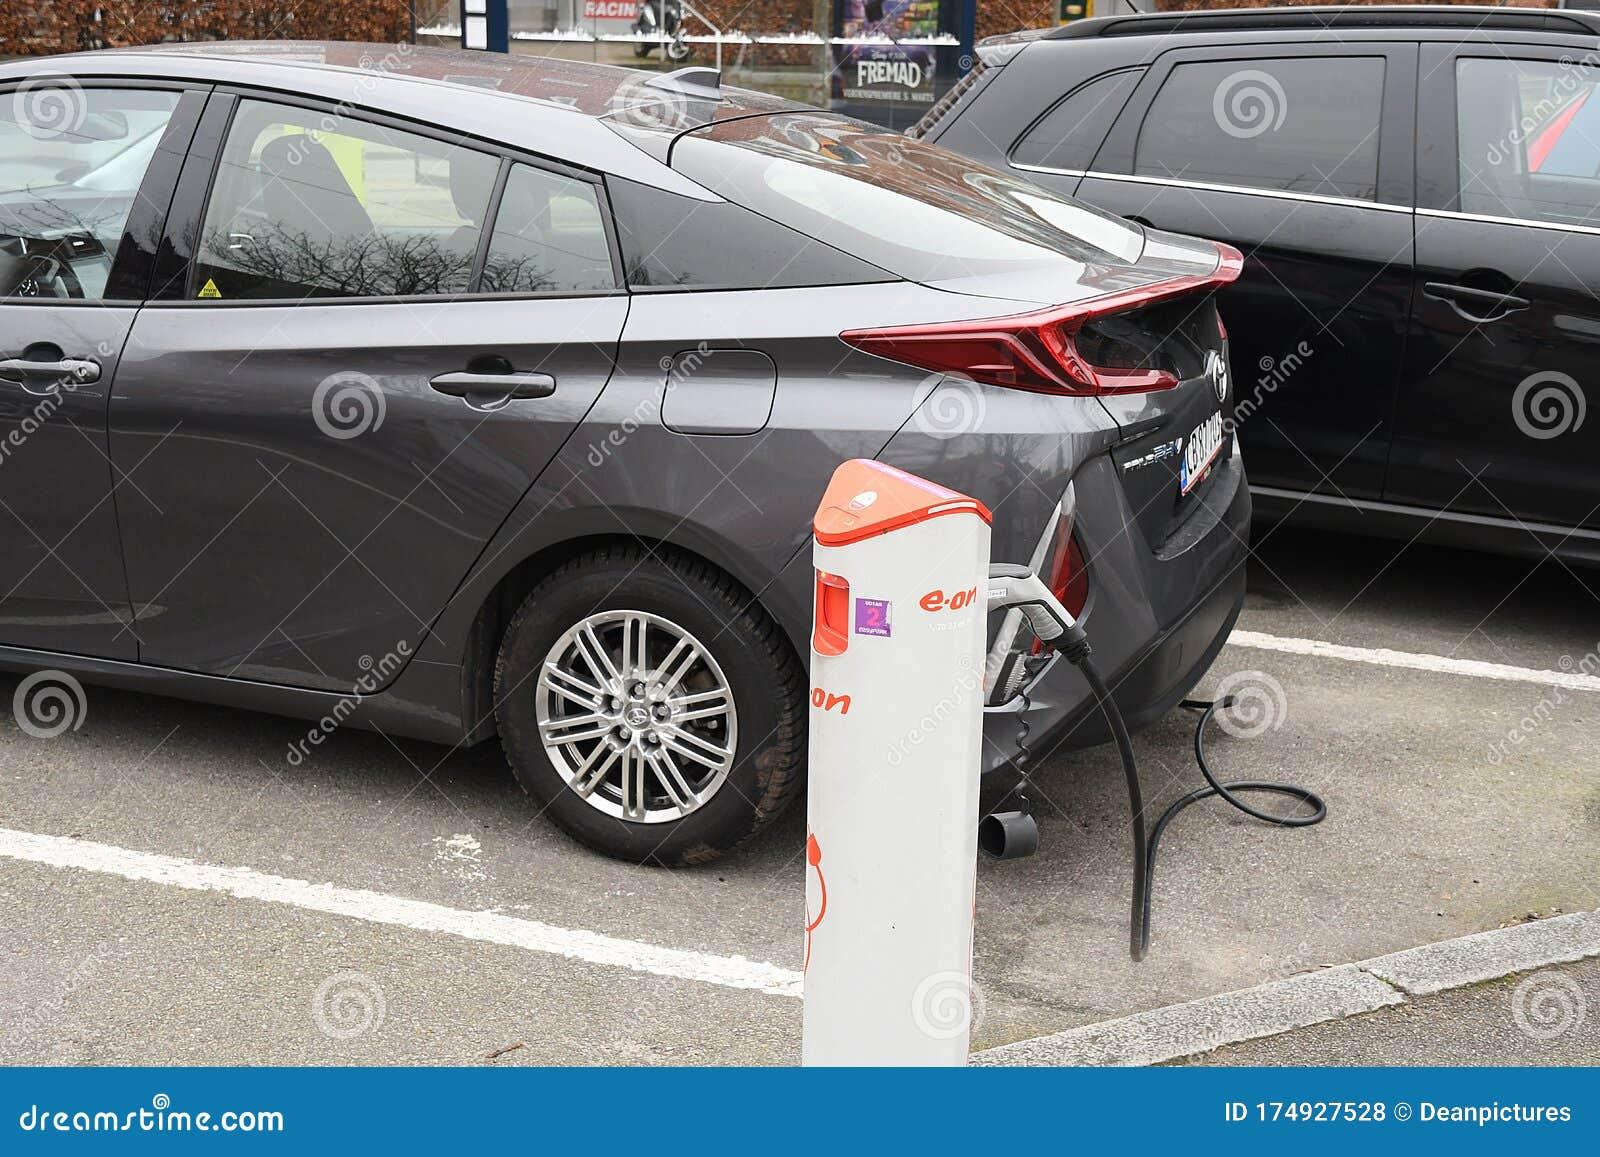 Electirc Auto At Charge Point N Copenhagen Editorial Stock Photo Image Of Vehcile Copenhagen 174927528